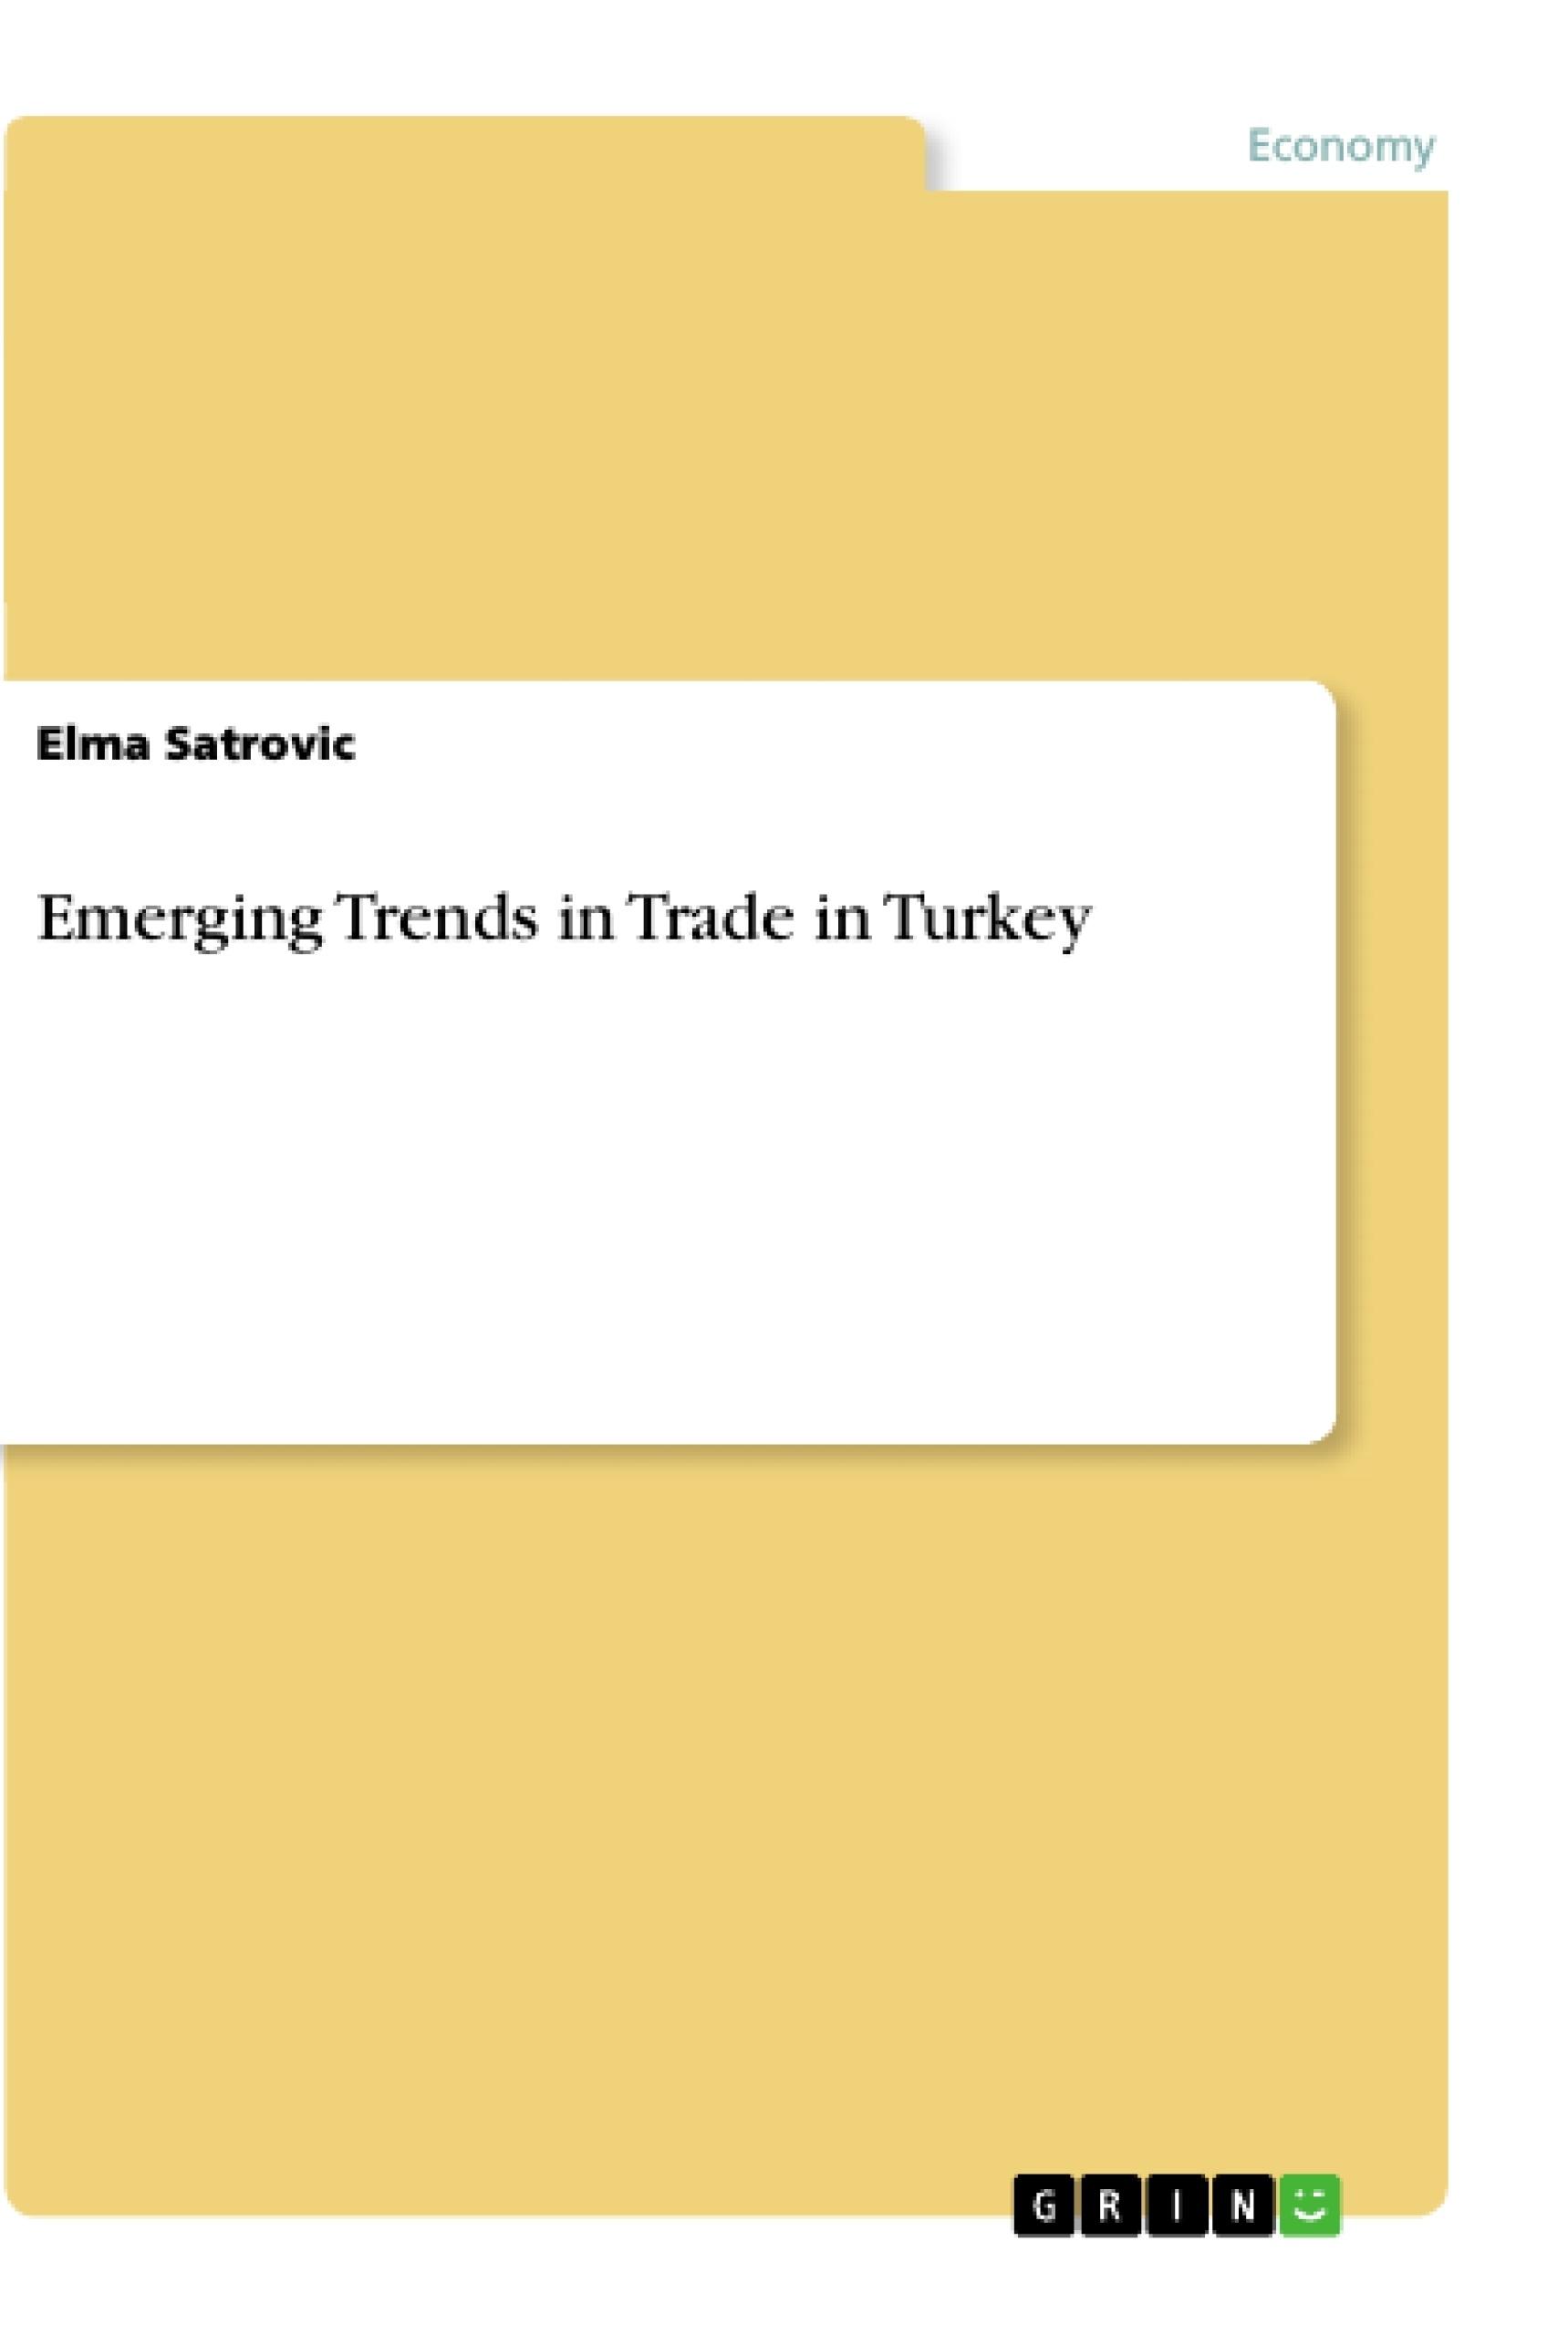 Title: Emerging Trends in Trade in Turkey